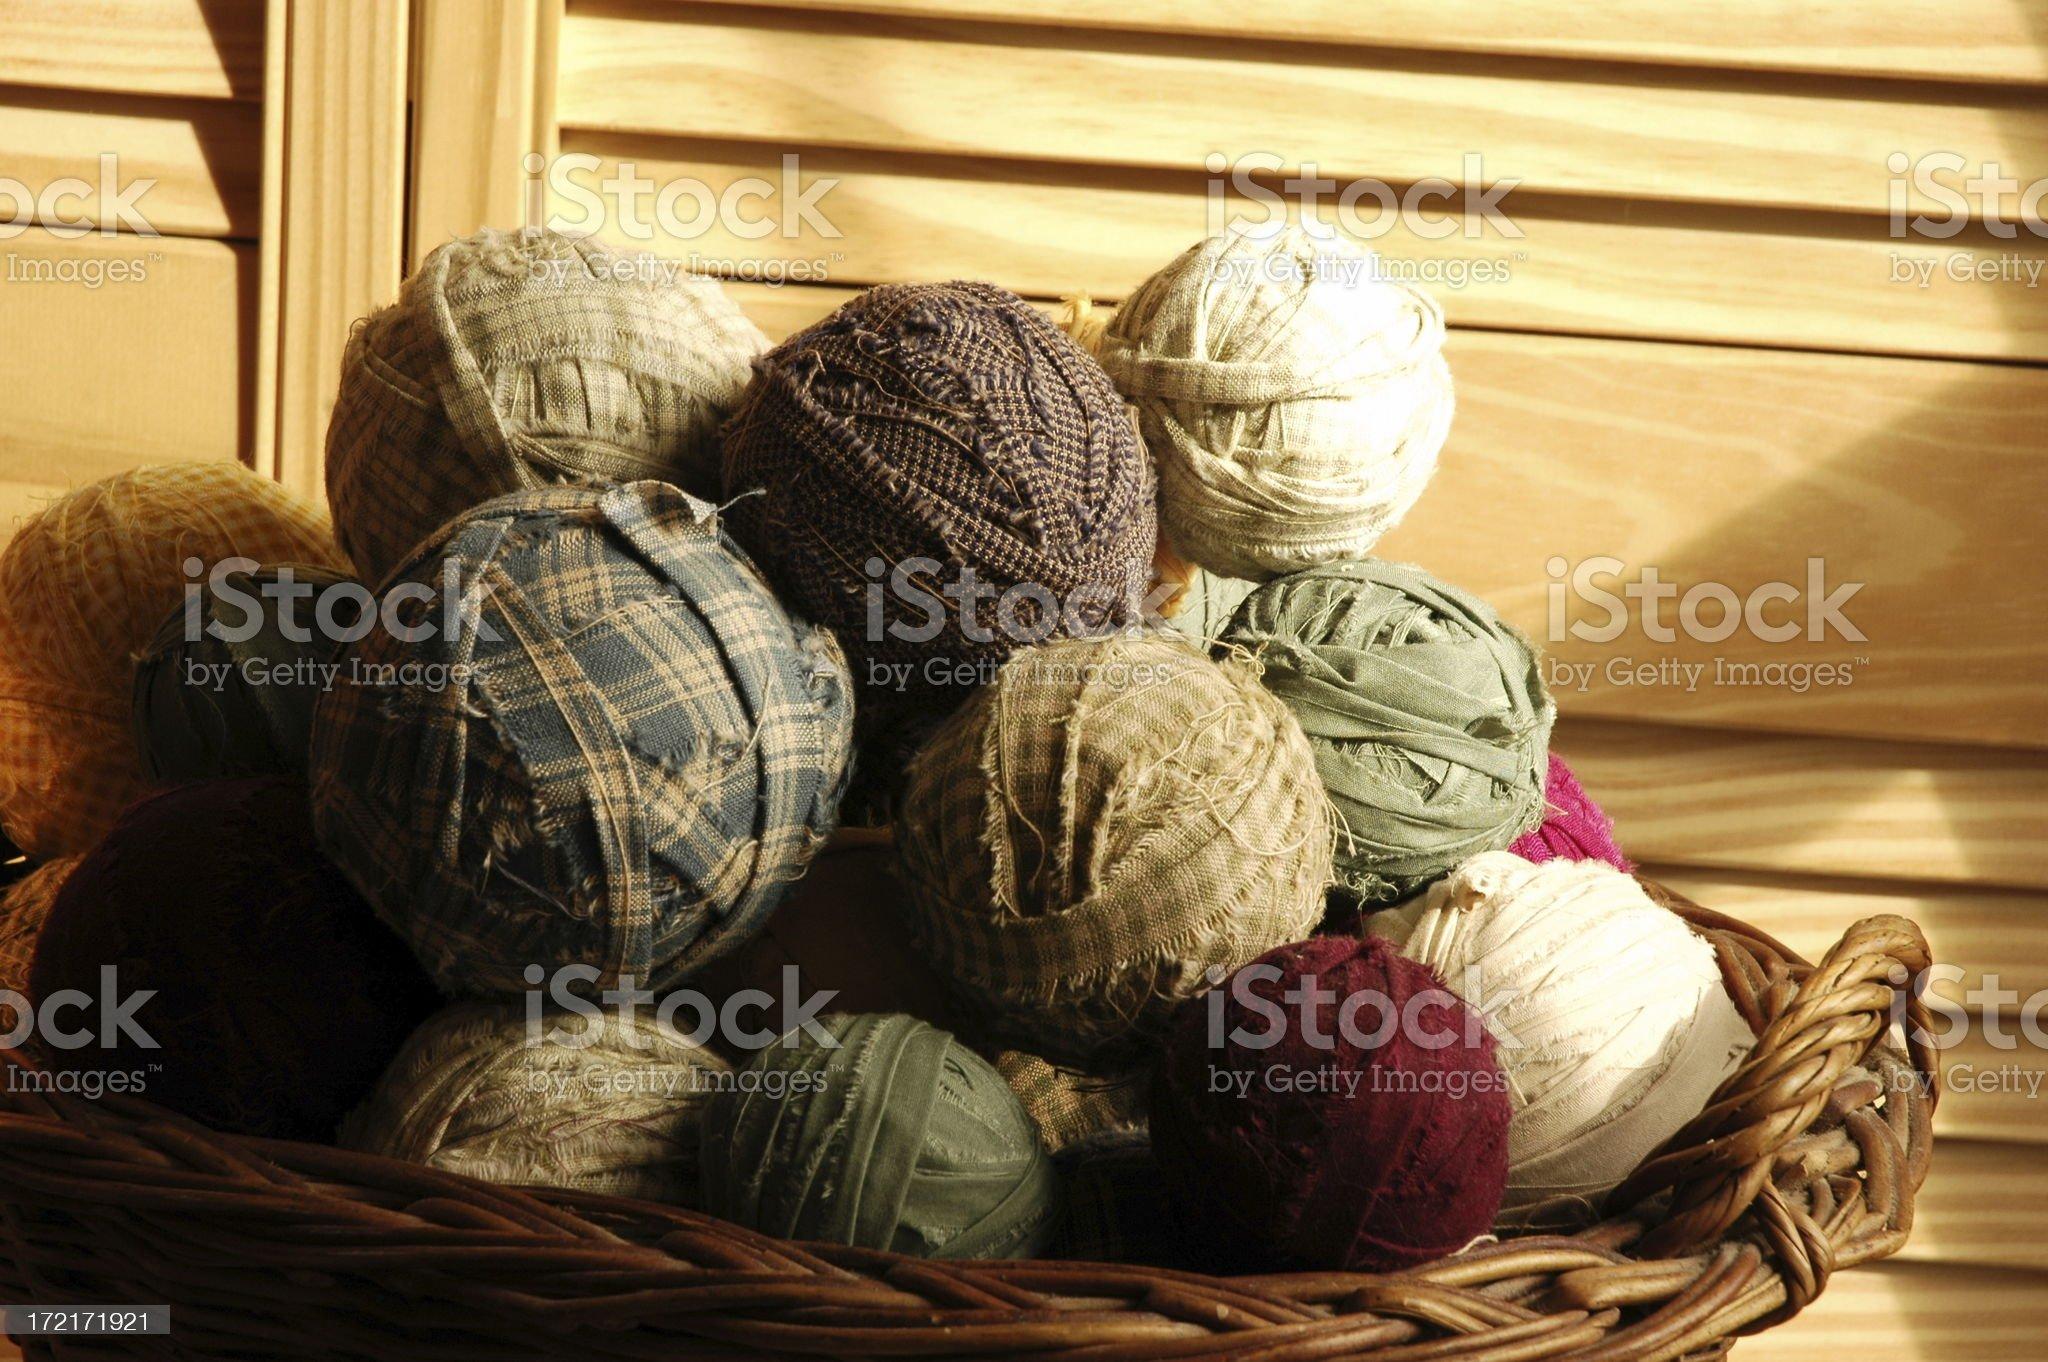 balls of fabric royalty-free stock photo